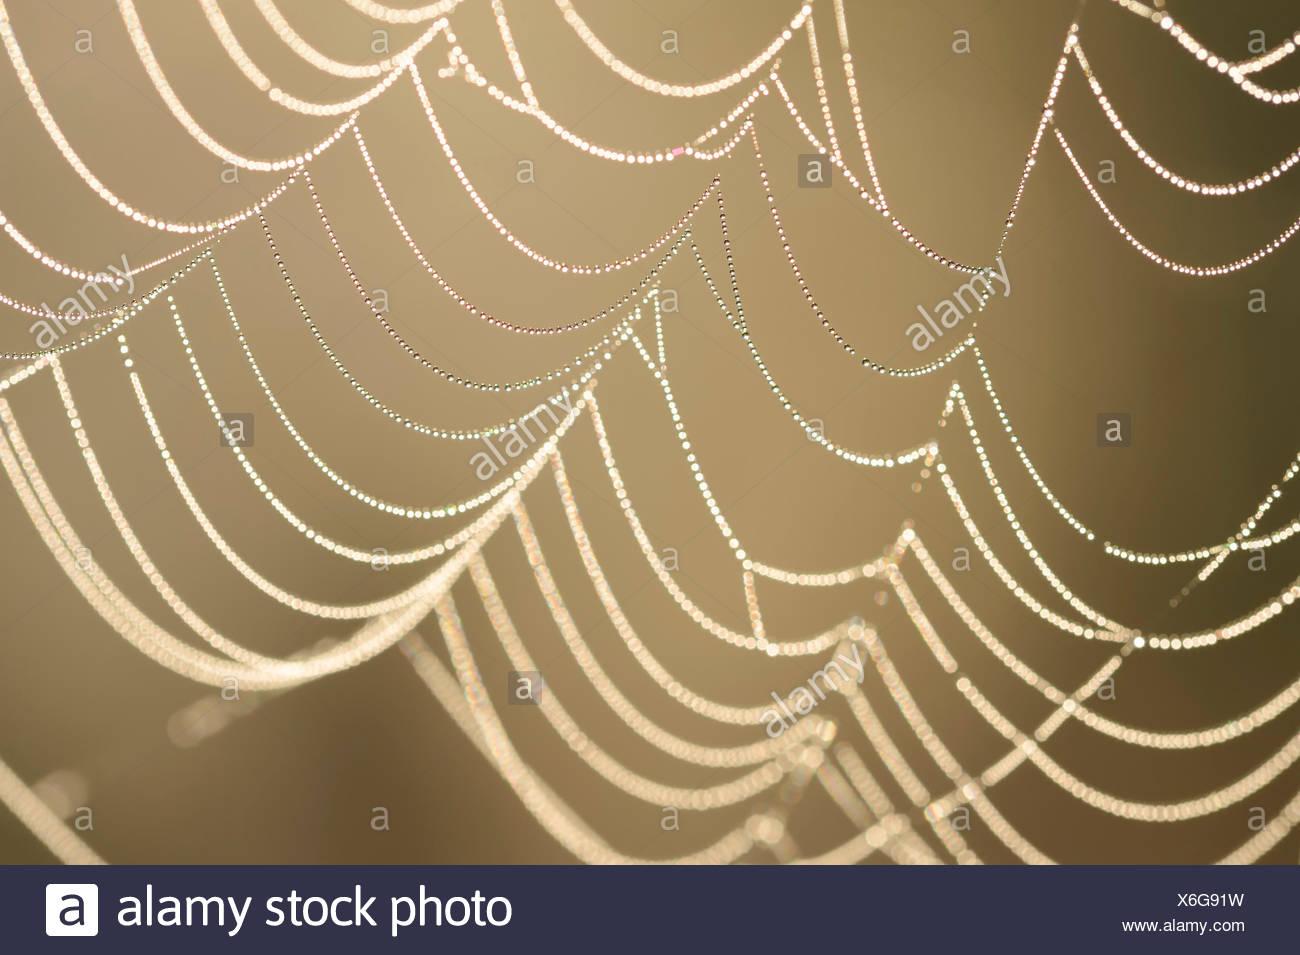 Spider web with dew drops, North Rhine-Westphalia, Germany - Stock Image